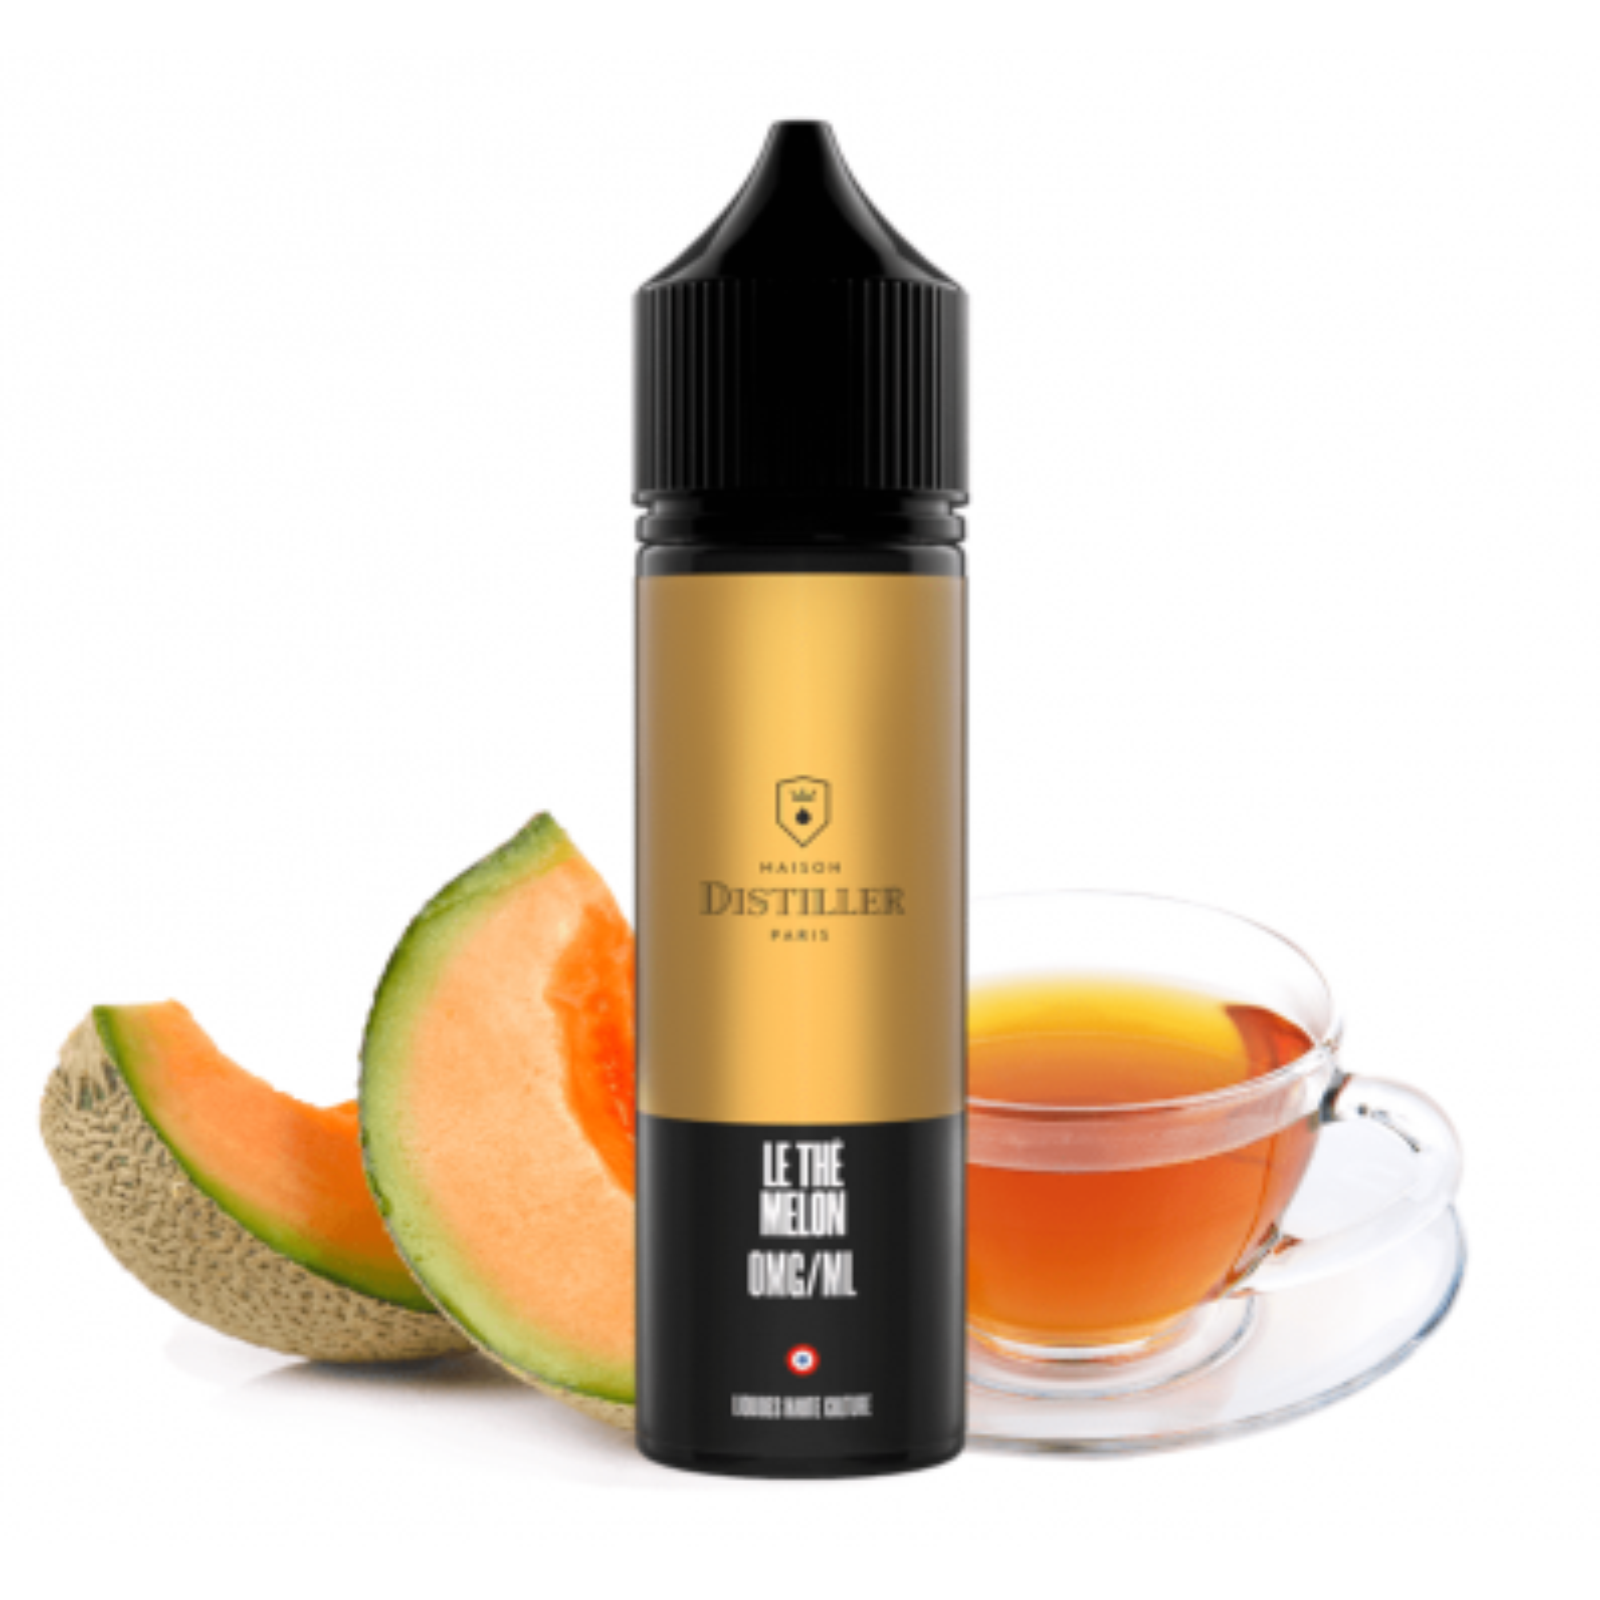 Le Thé Melon 50ml - Le Distiller